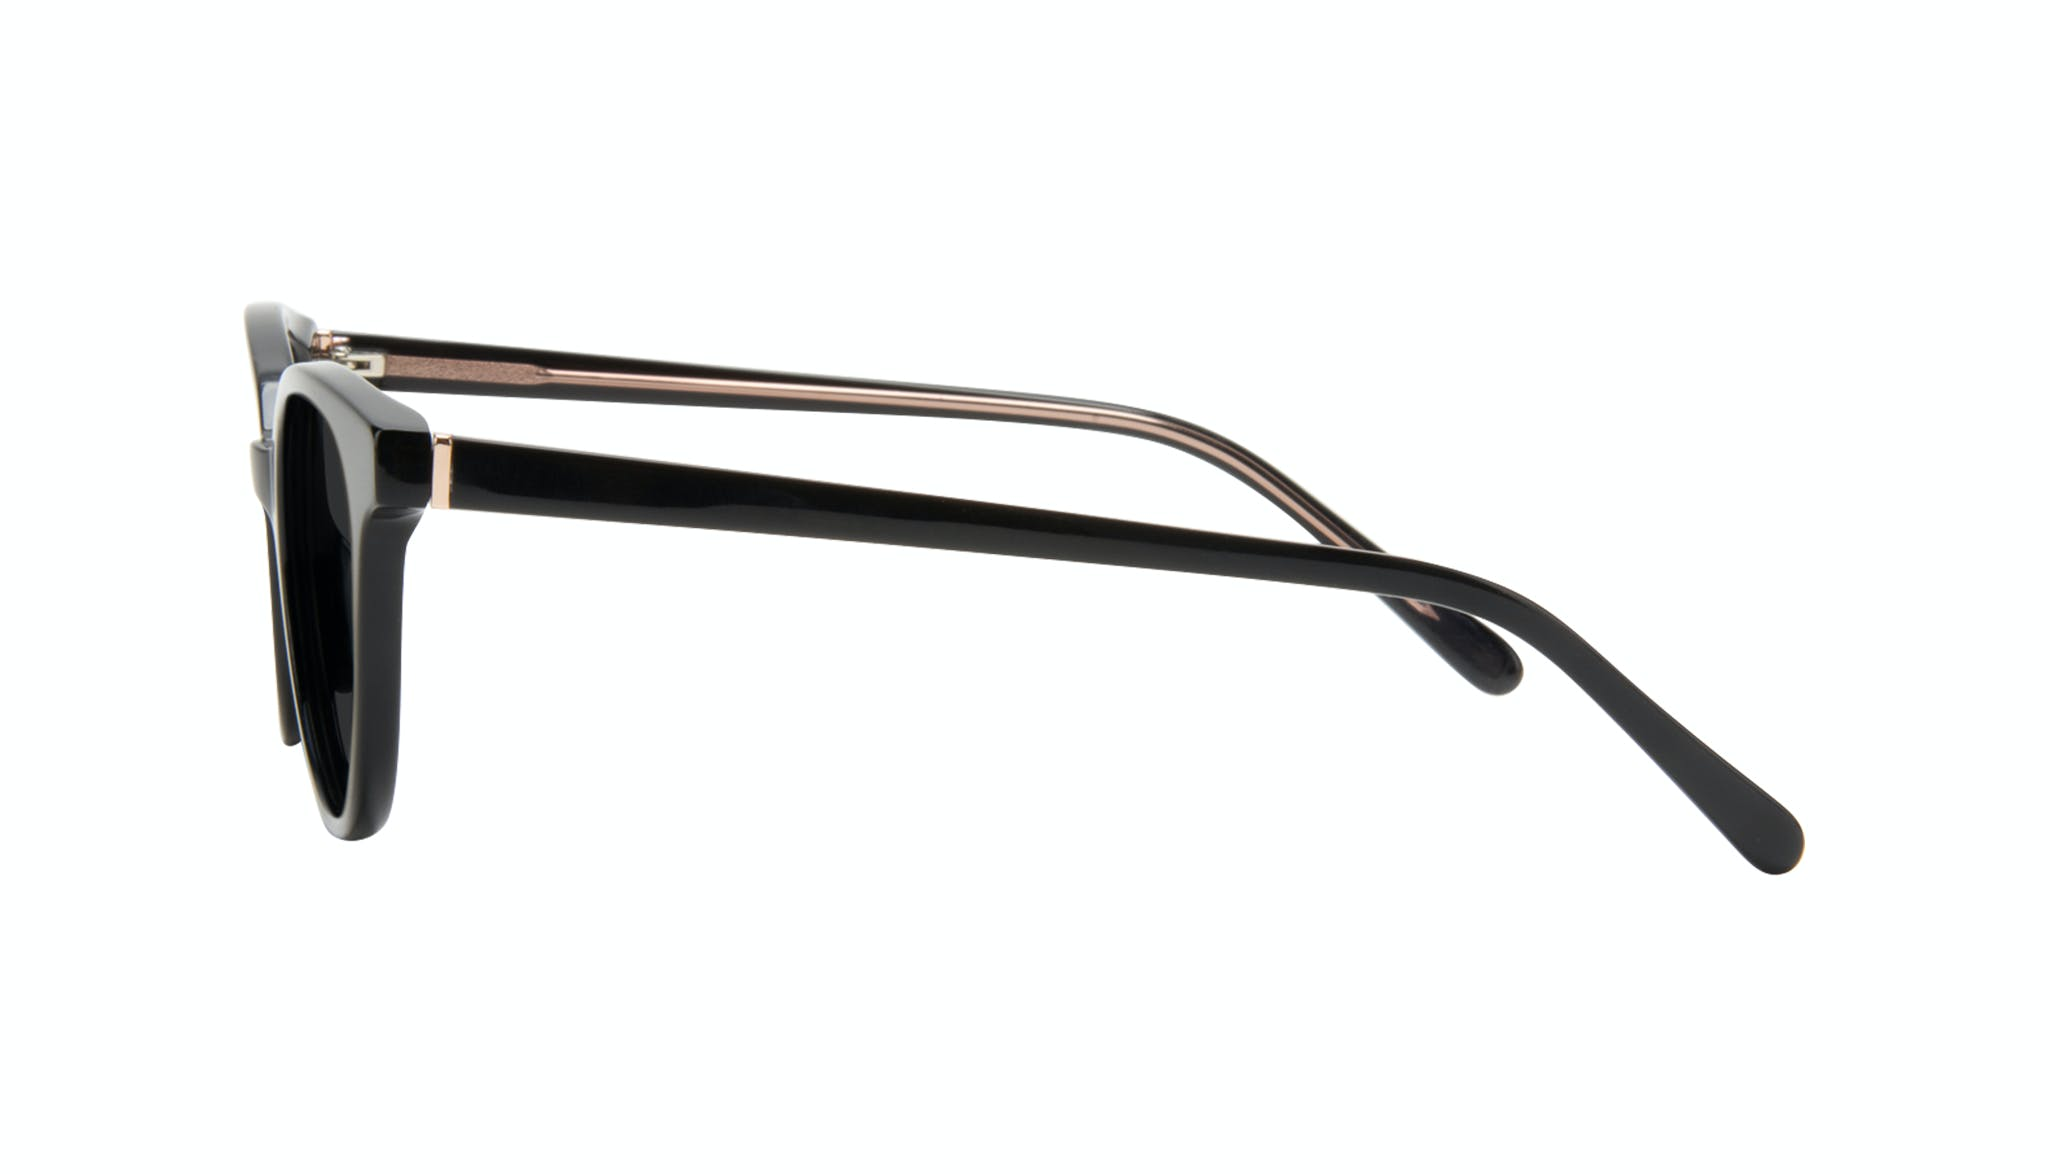 Affordable Fashion Glasses Round Sunglasses Women Bright Black Side